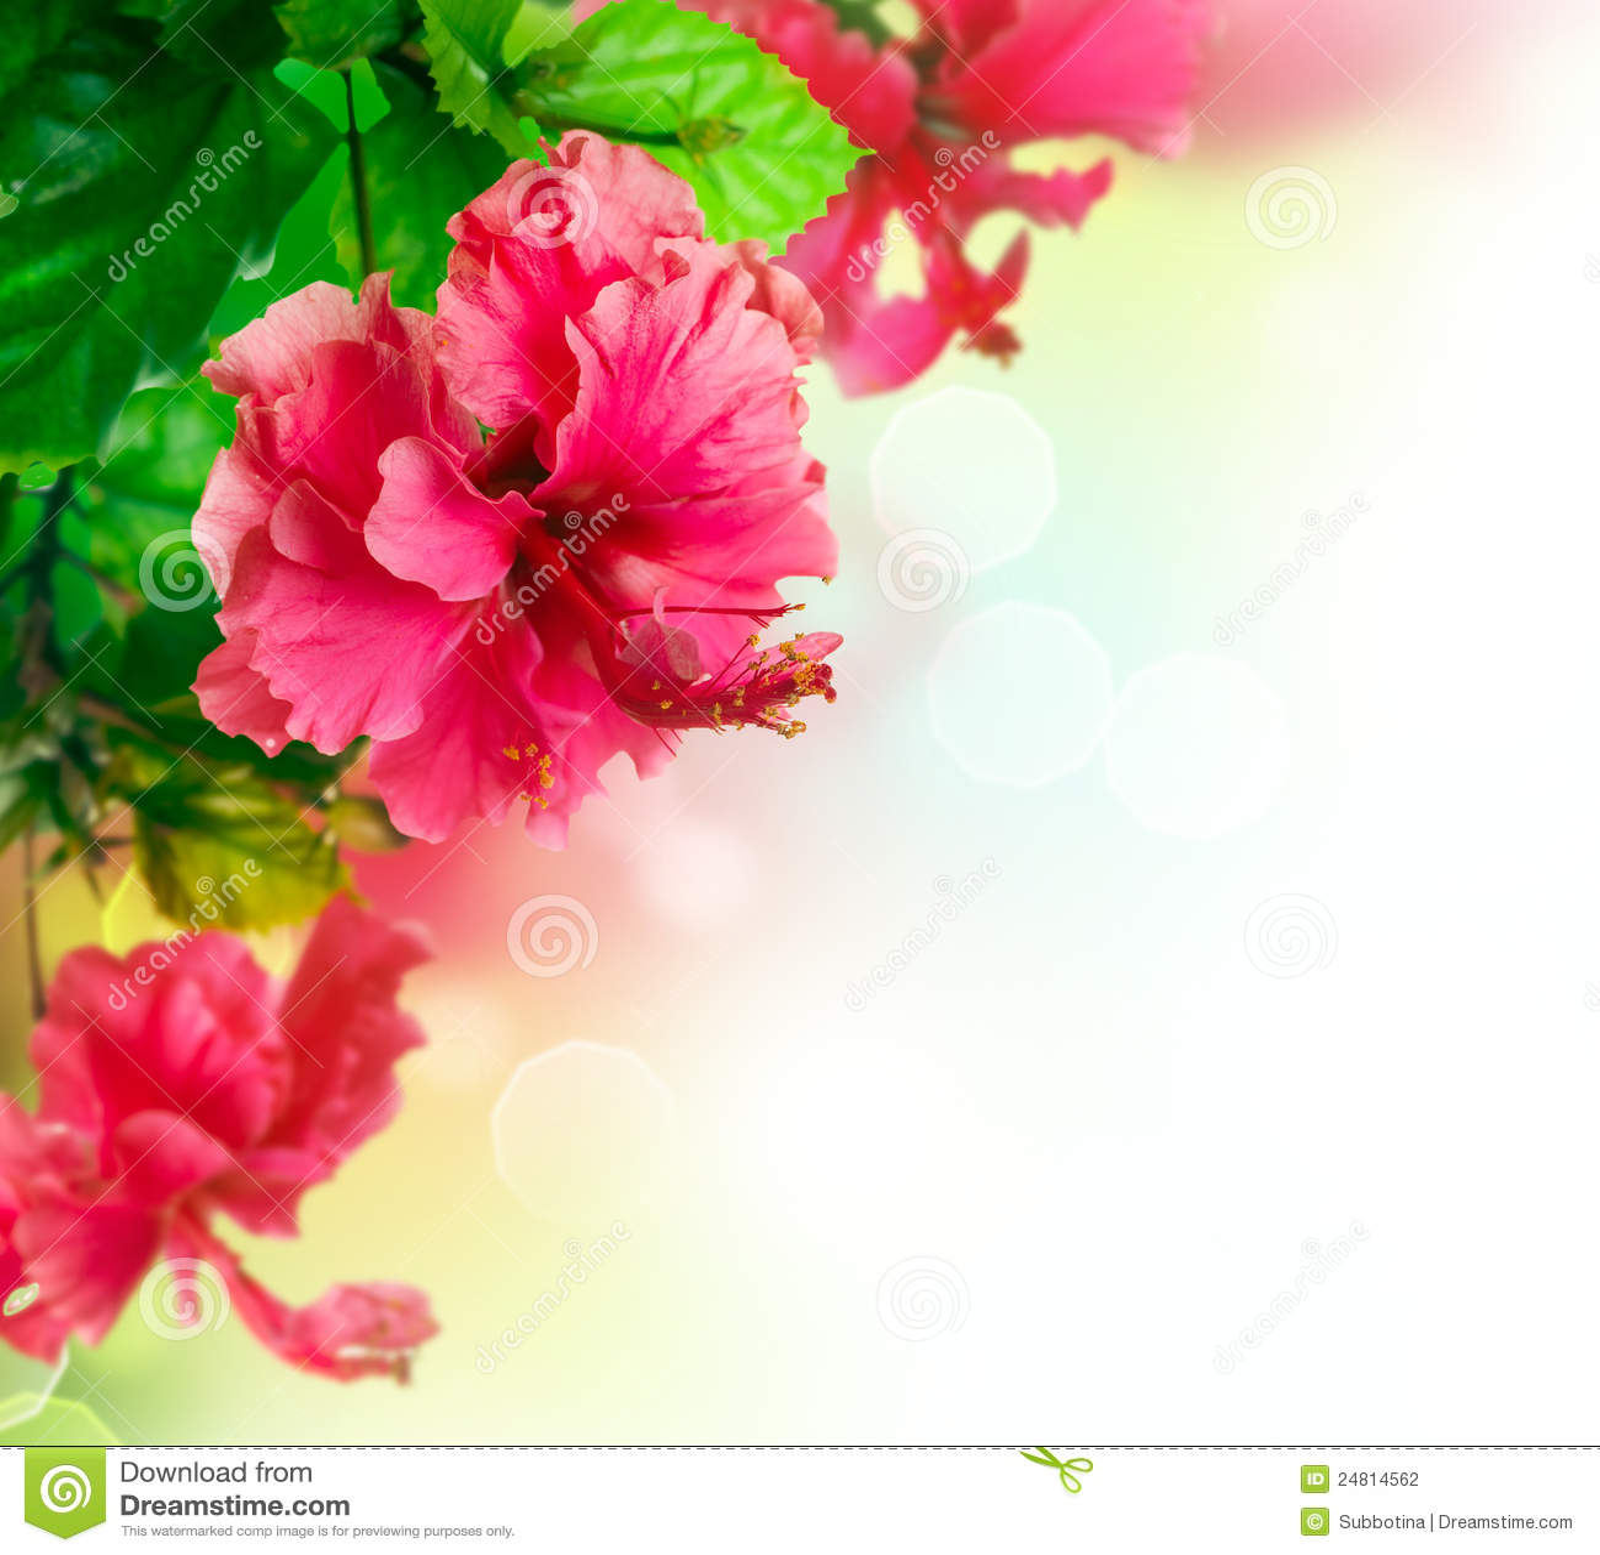 Hibiscus Flower Border Design Stock Photography Image